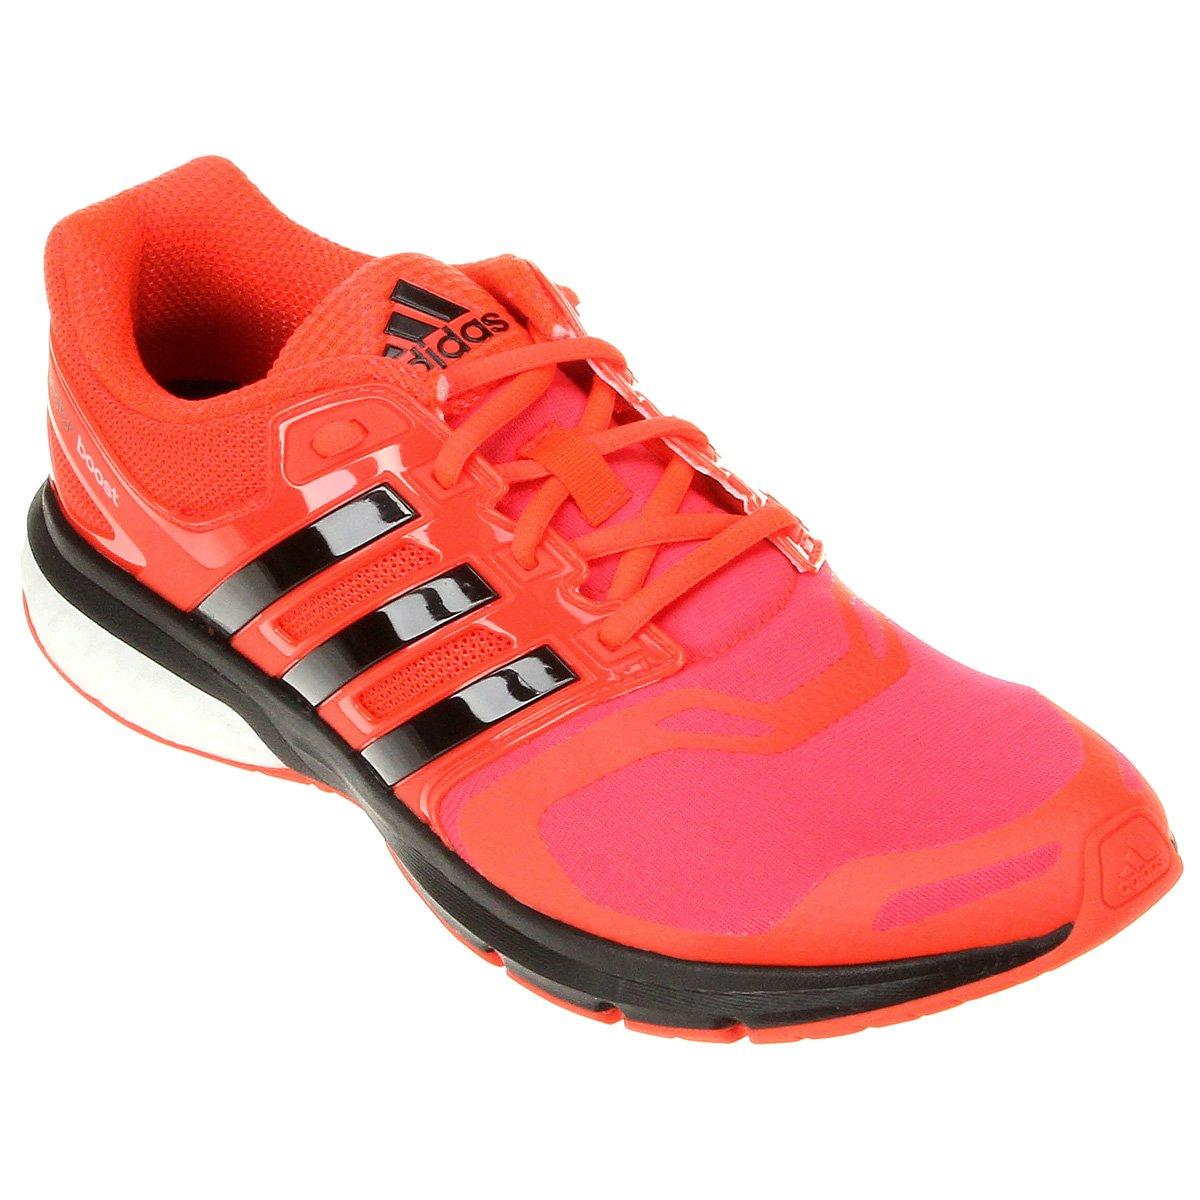 5671a53a7f5 Tênis Adidas Questar Boost Techfit - Compre Agora